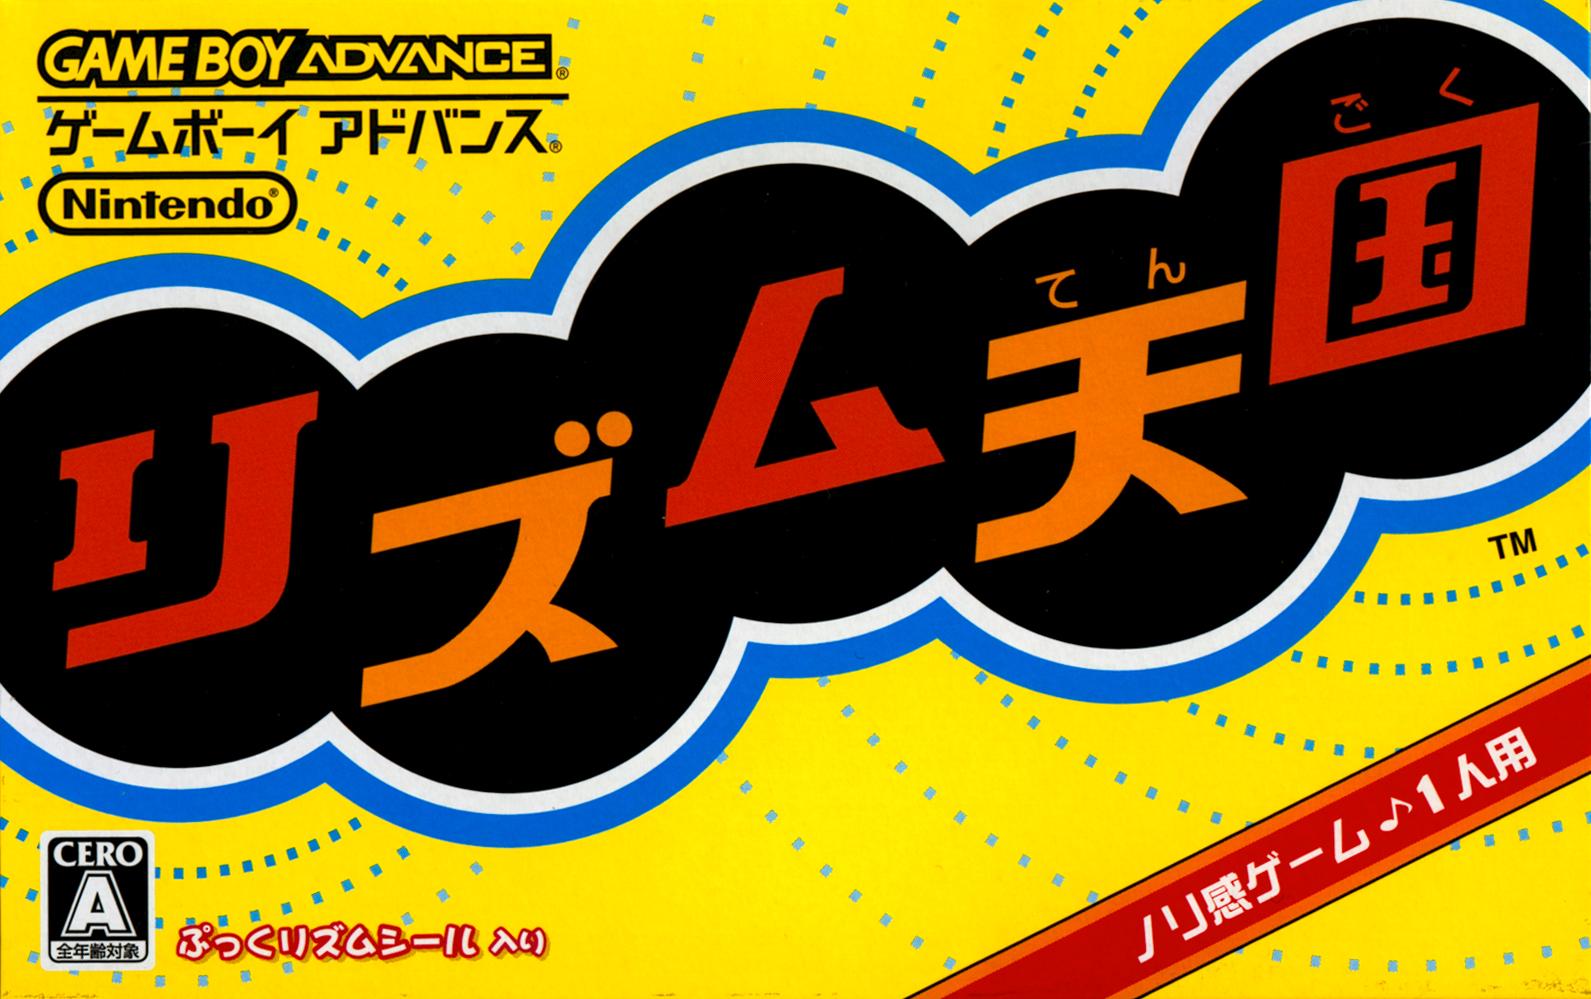 Game boy color pooh wiki - Rhythm Game By Nintendo J P Room